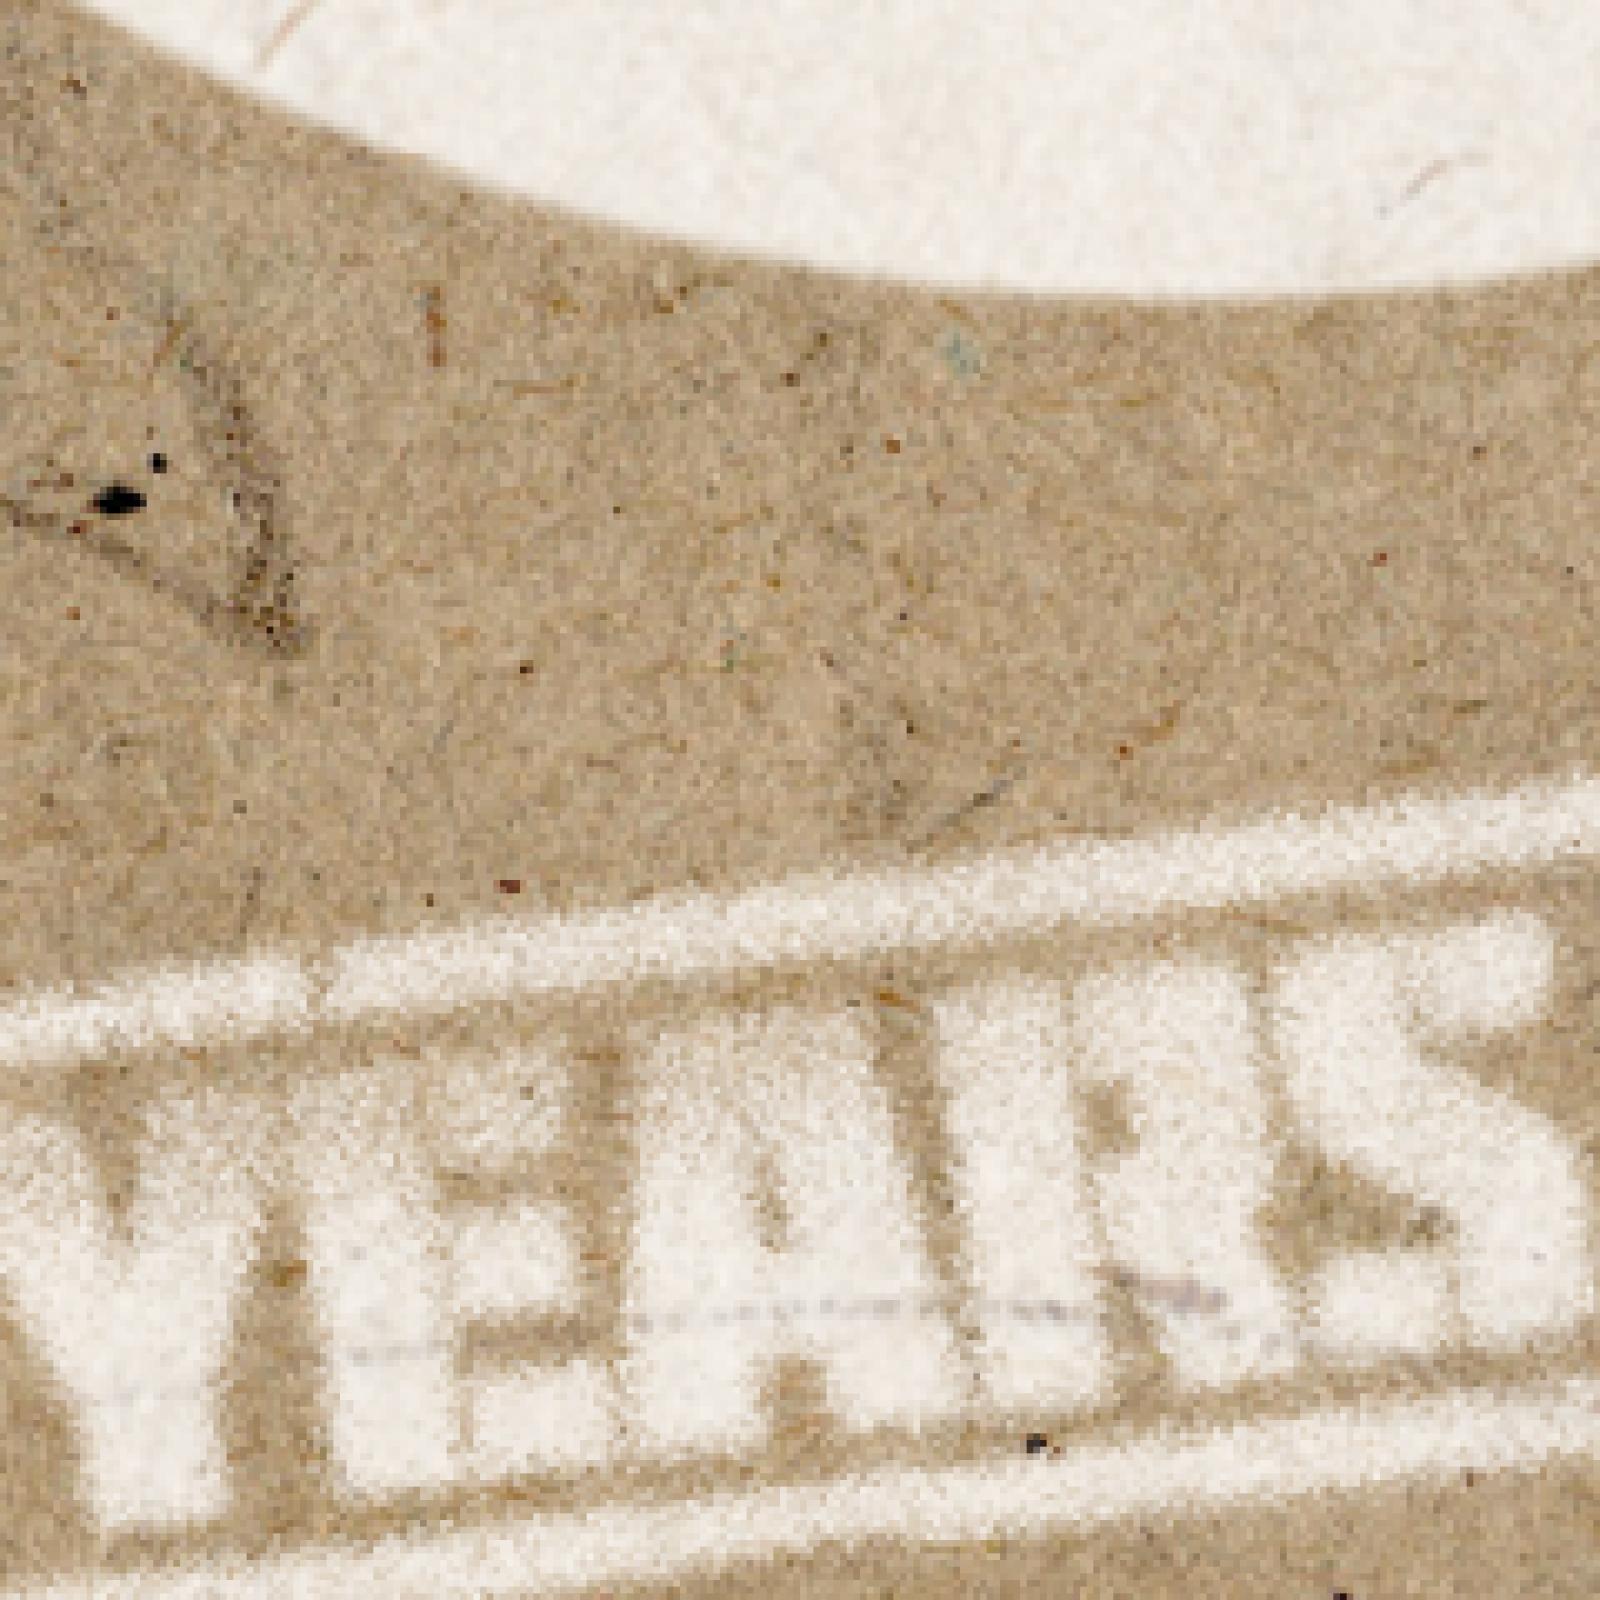 6 years hiphopfreiburg.de sampler